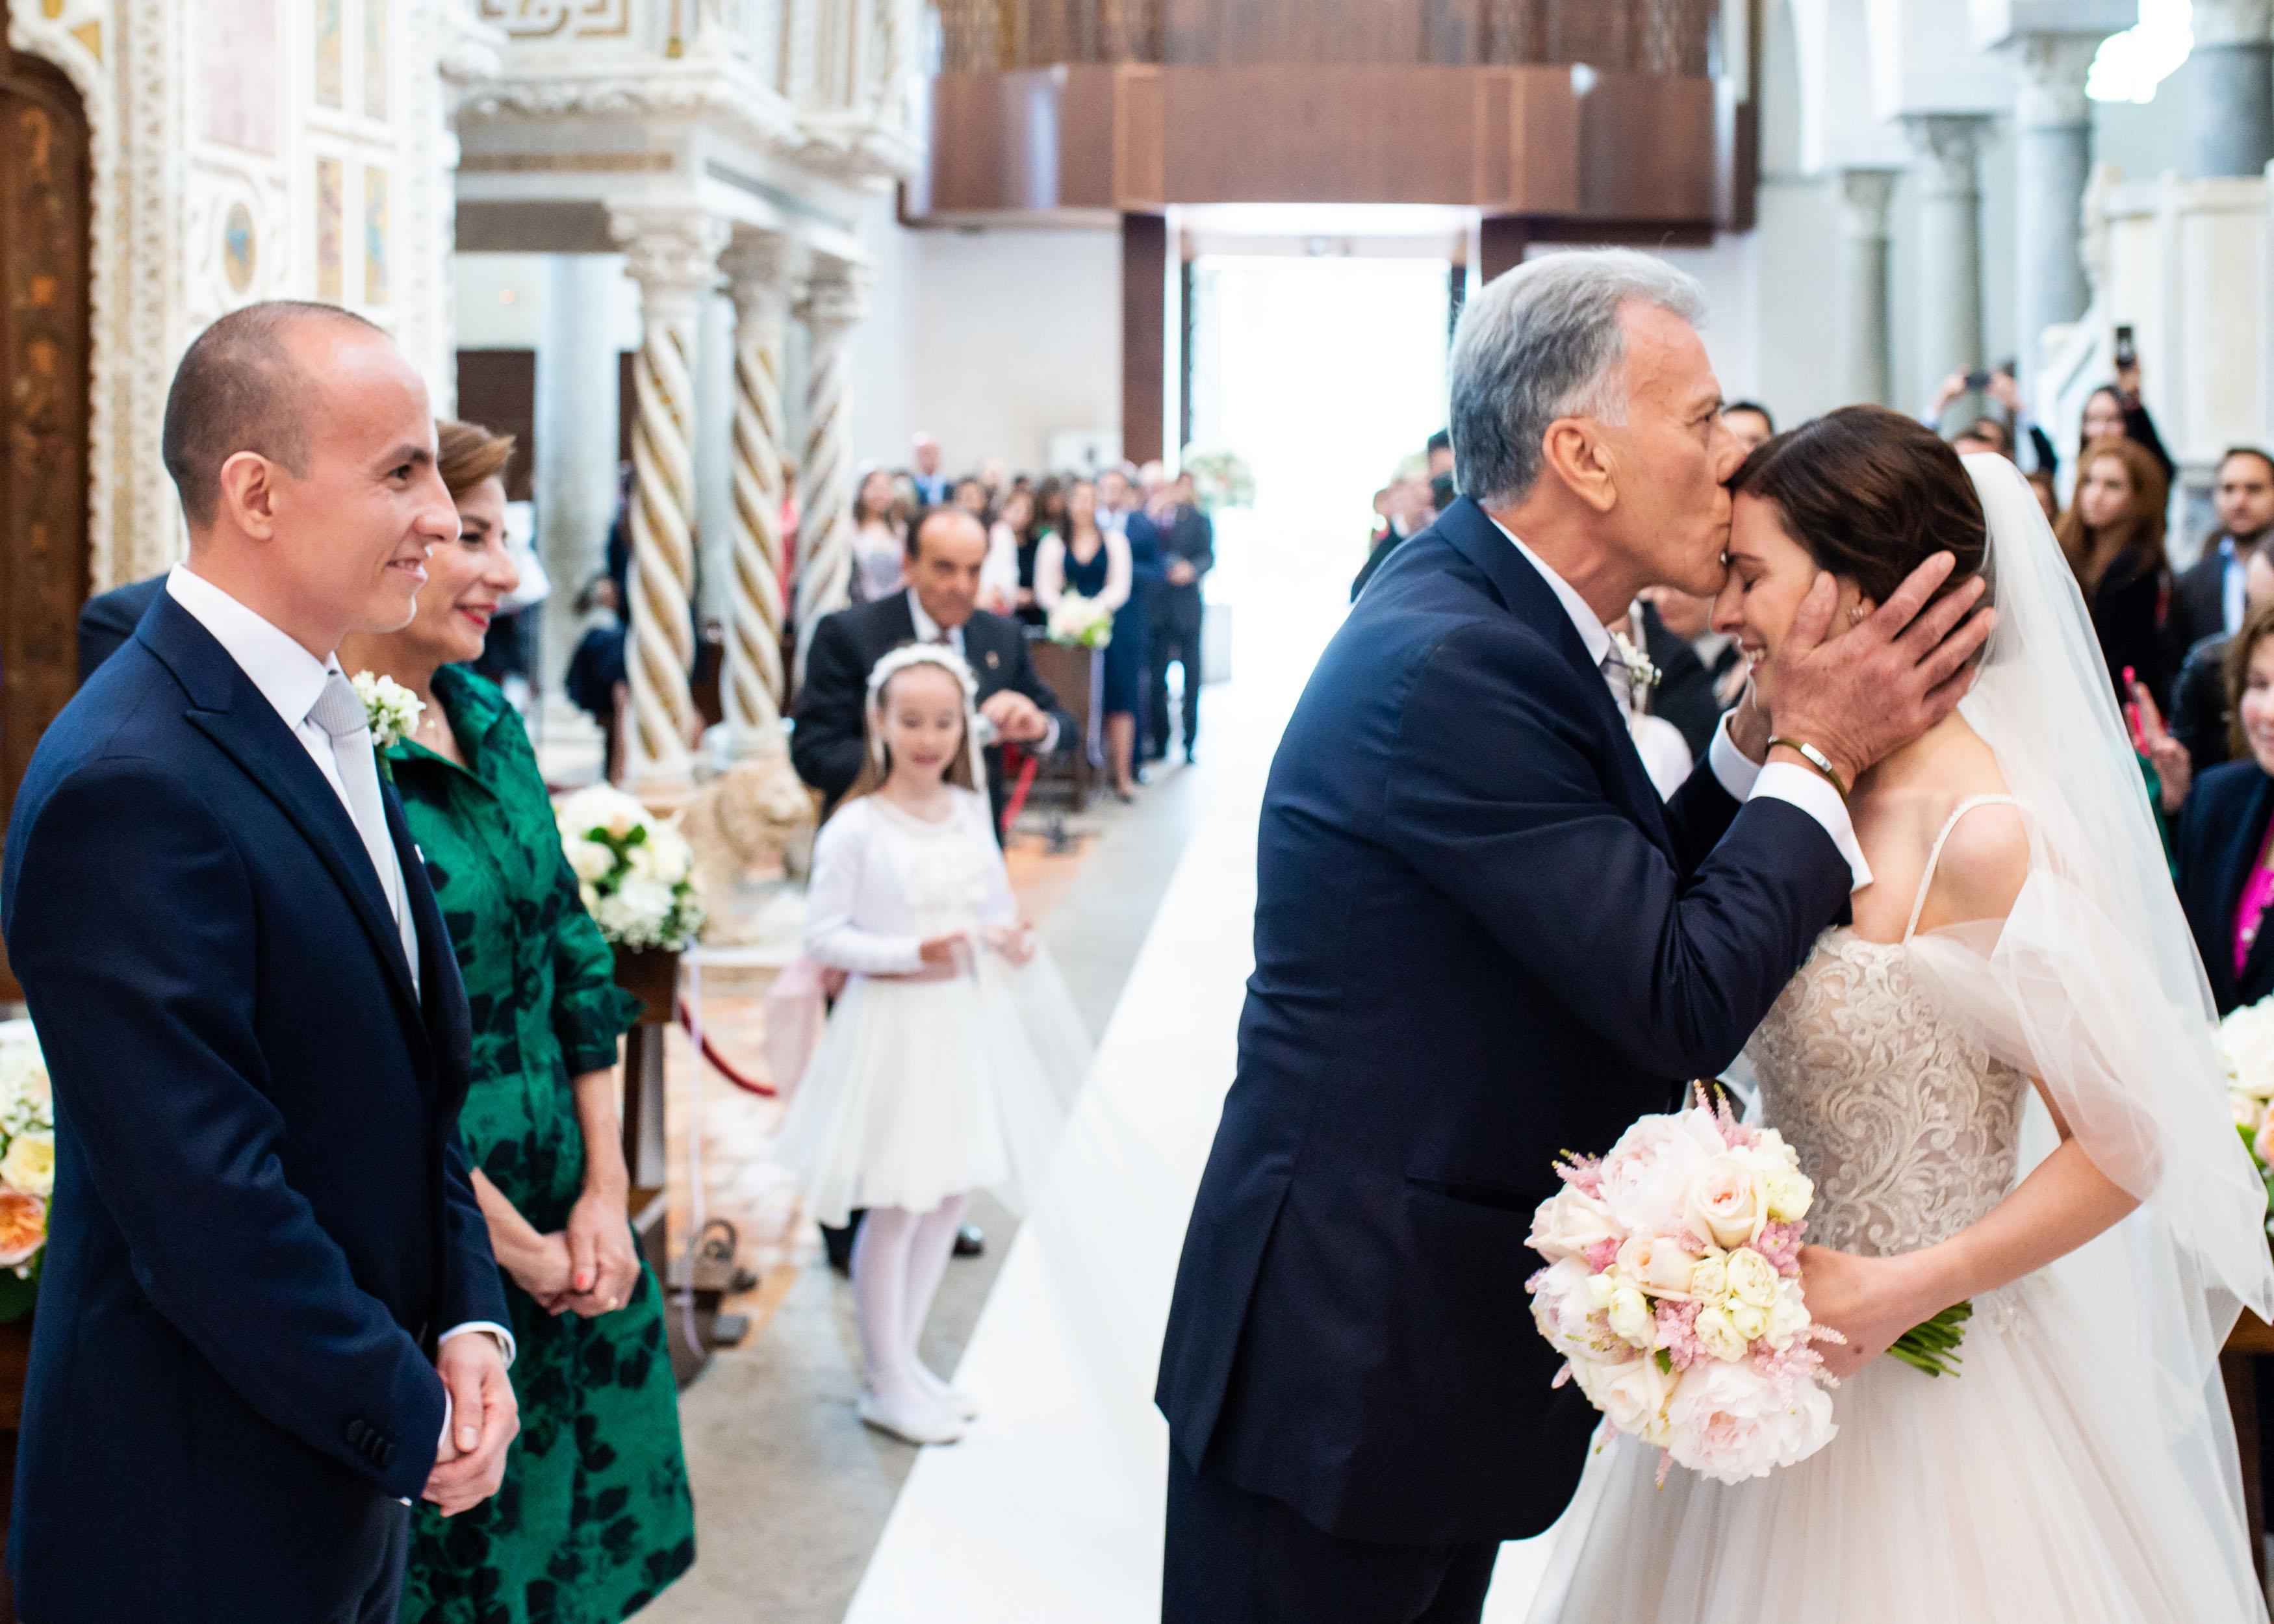 http://www.weddingamalfi.com/wp-content/uploads/Katia-Jorge-18-maggio-2019-25.jpg